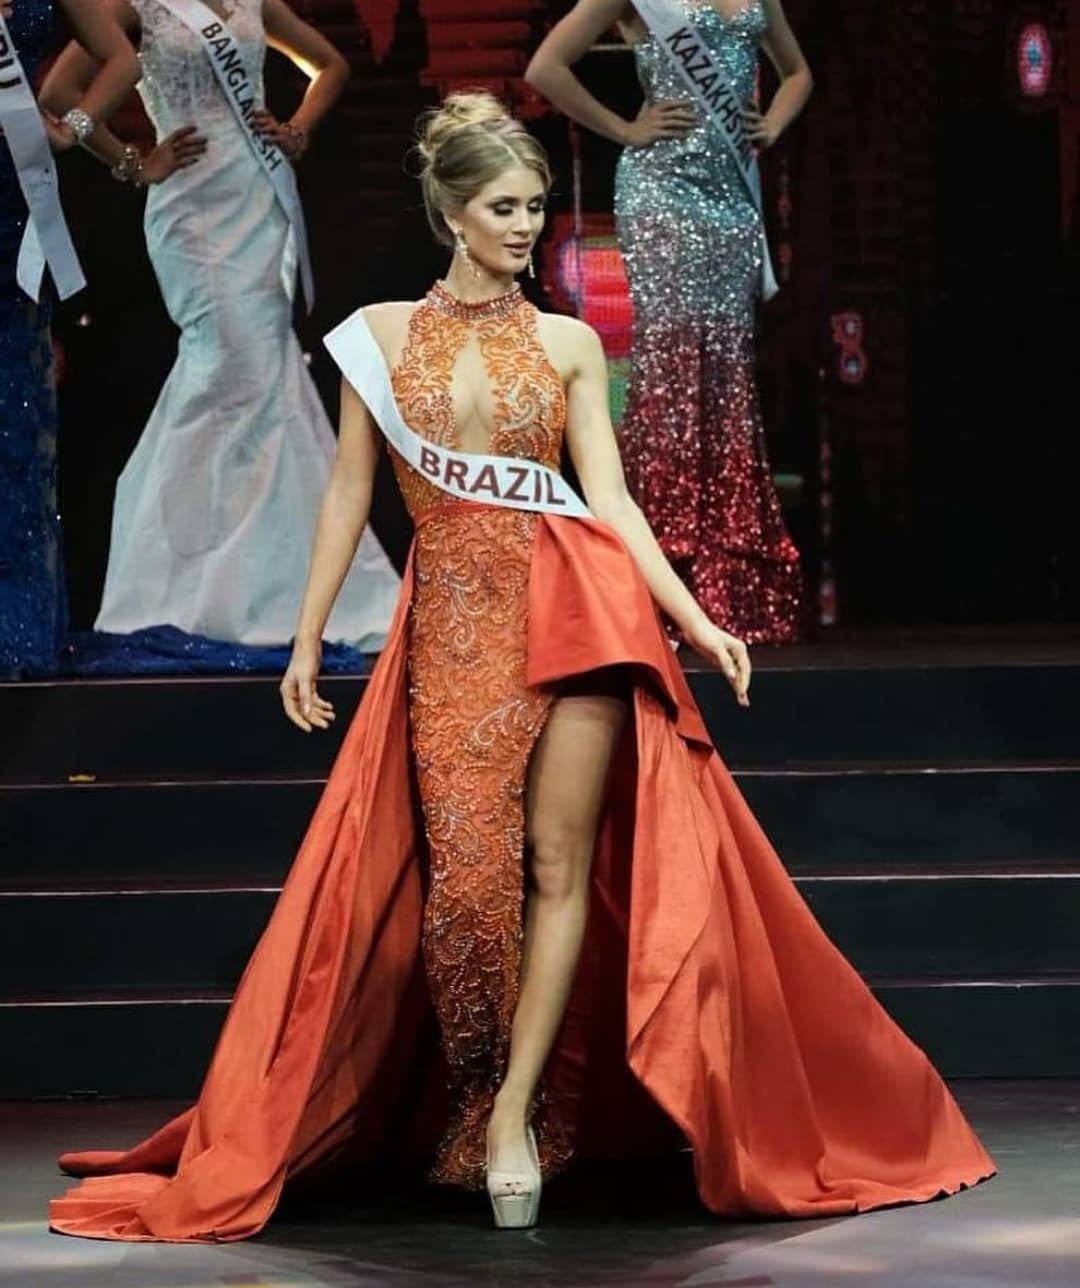 gabriela palma, miss brasil empresarial 2018. - Página 20 42182910